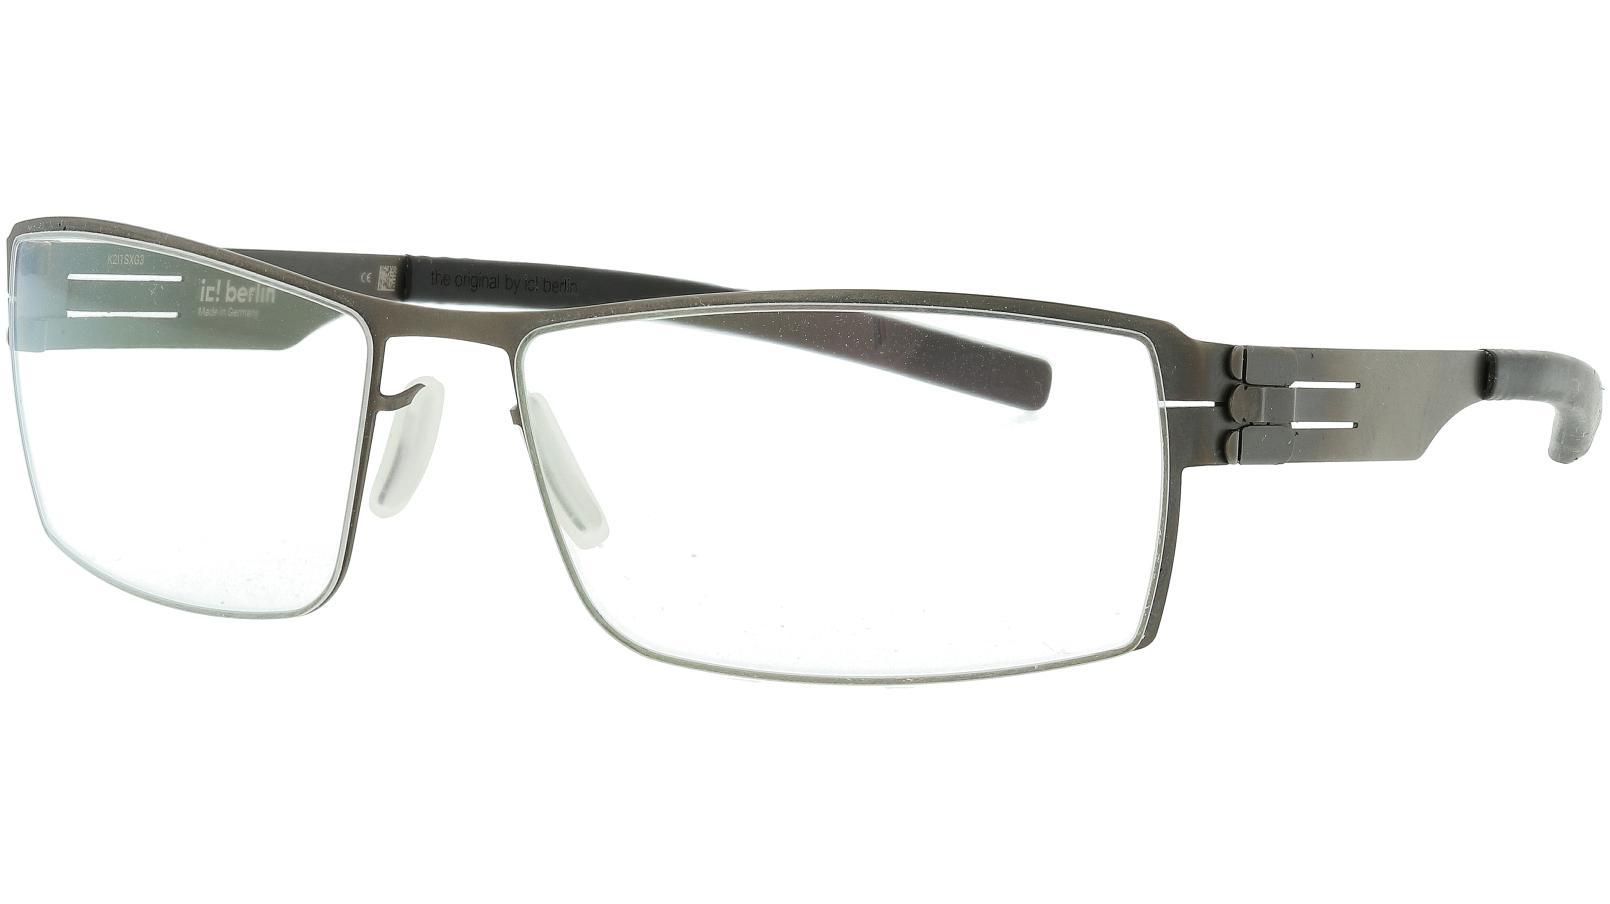 IC BERLIN! Nufenen Medium Graphite Grey Glasses